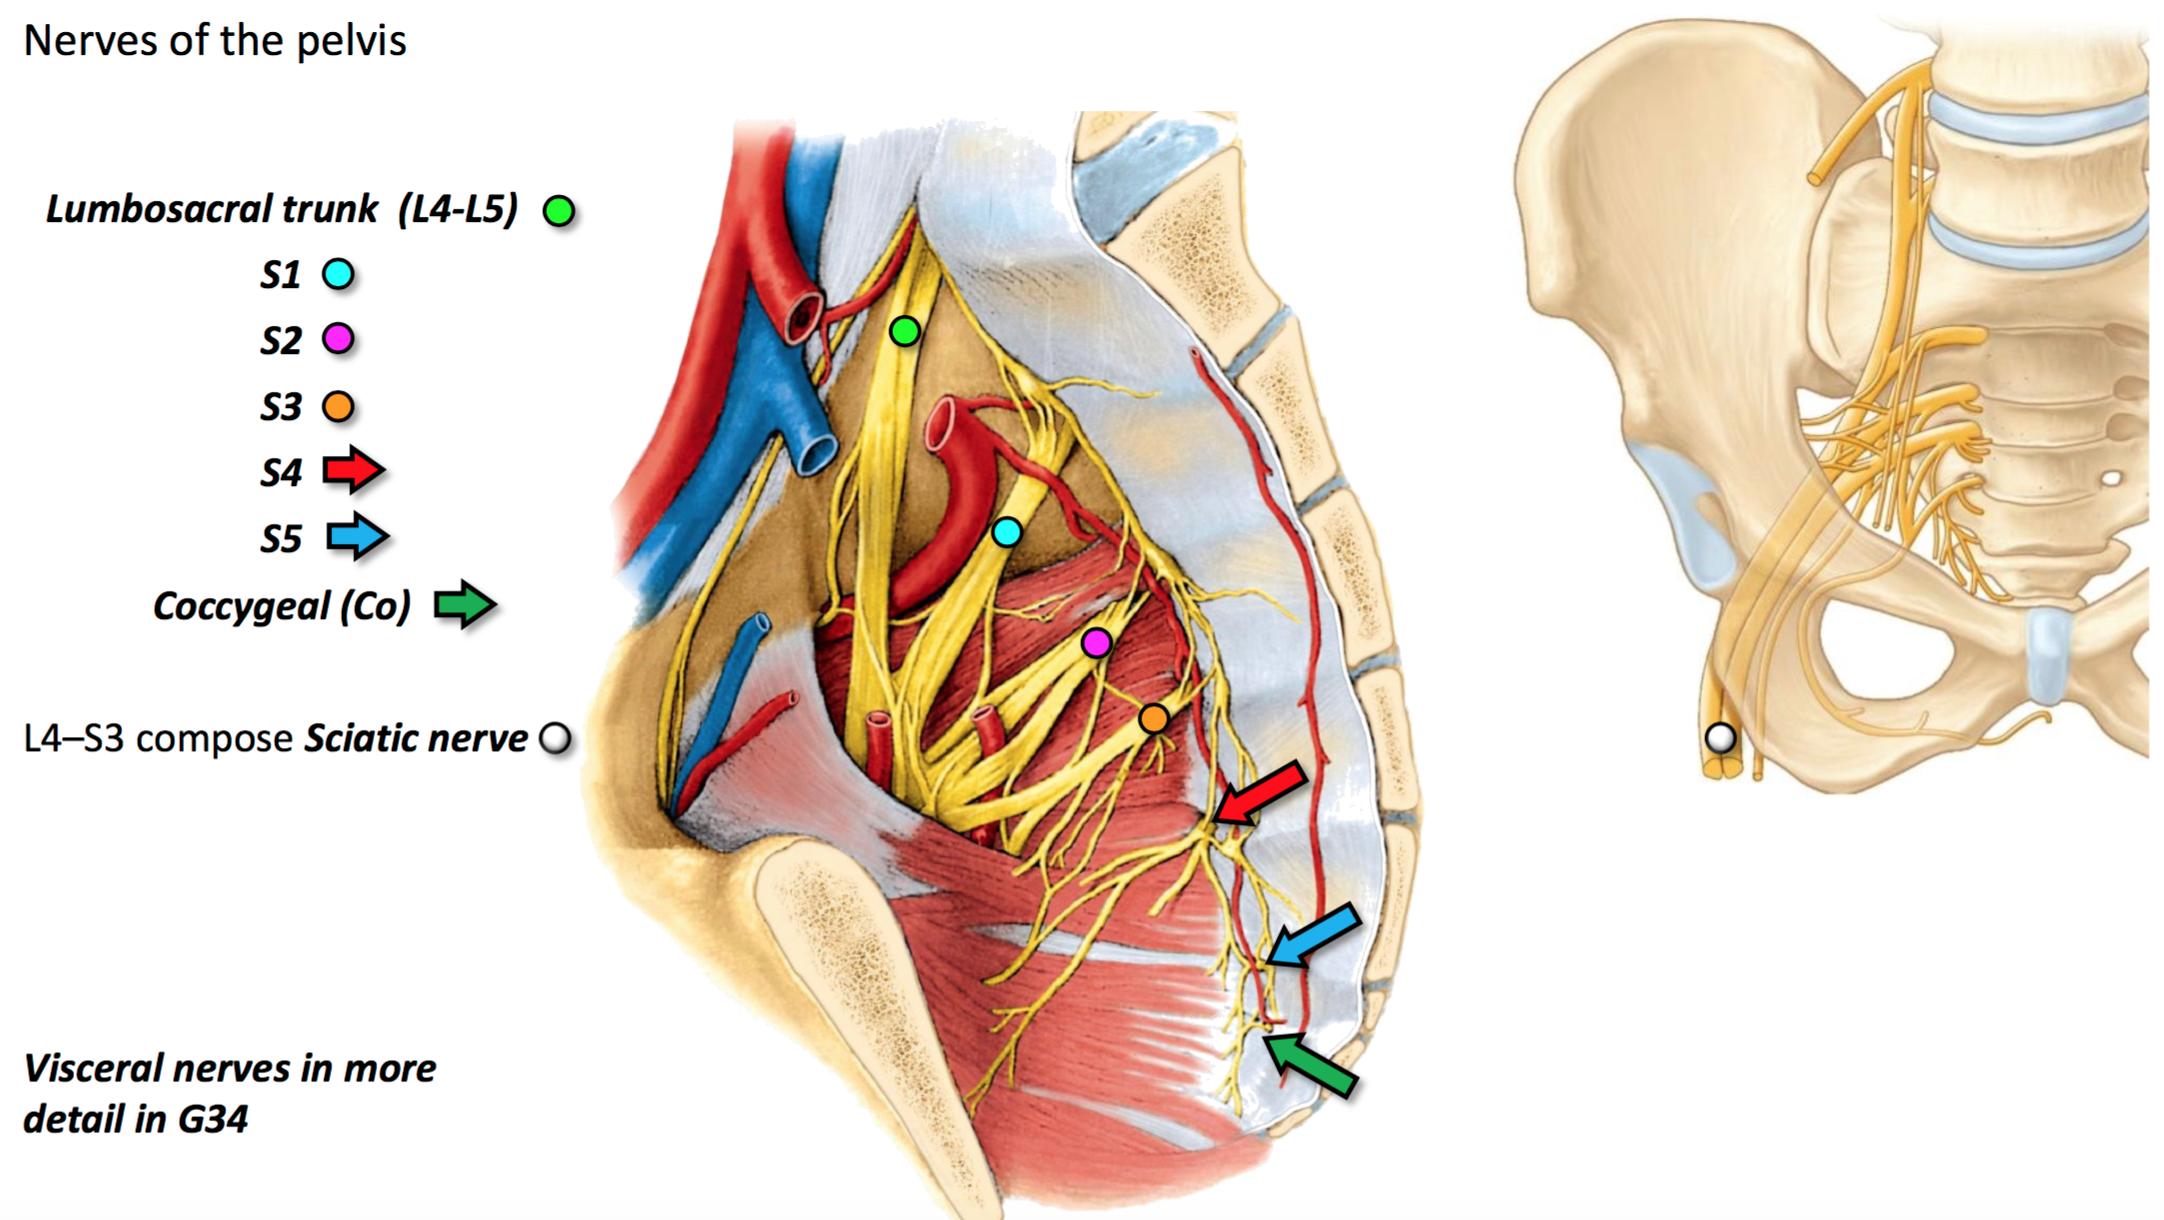 Asombroso Aris Mhhe Com Anatomy And Physiology Viñeta - Imágenes de ...